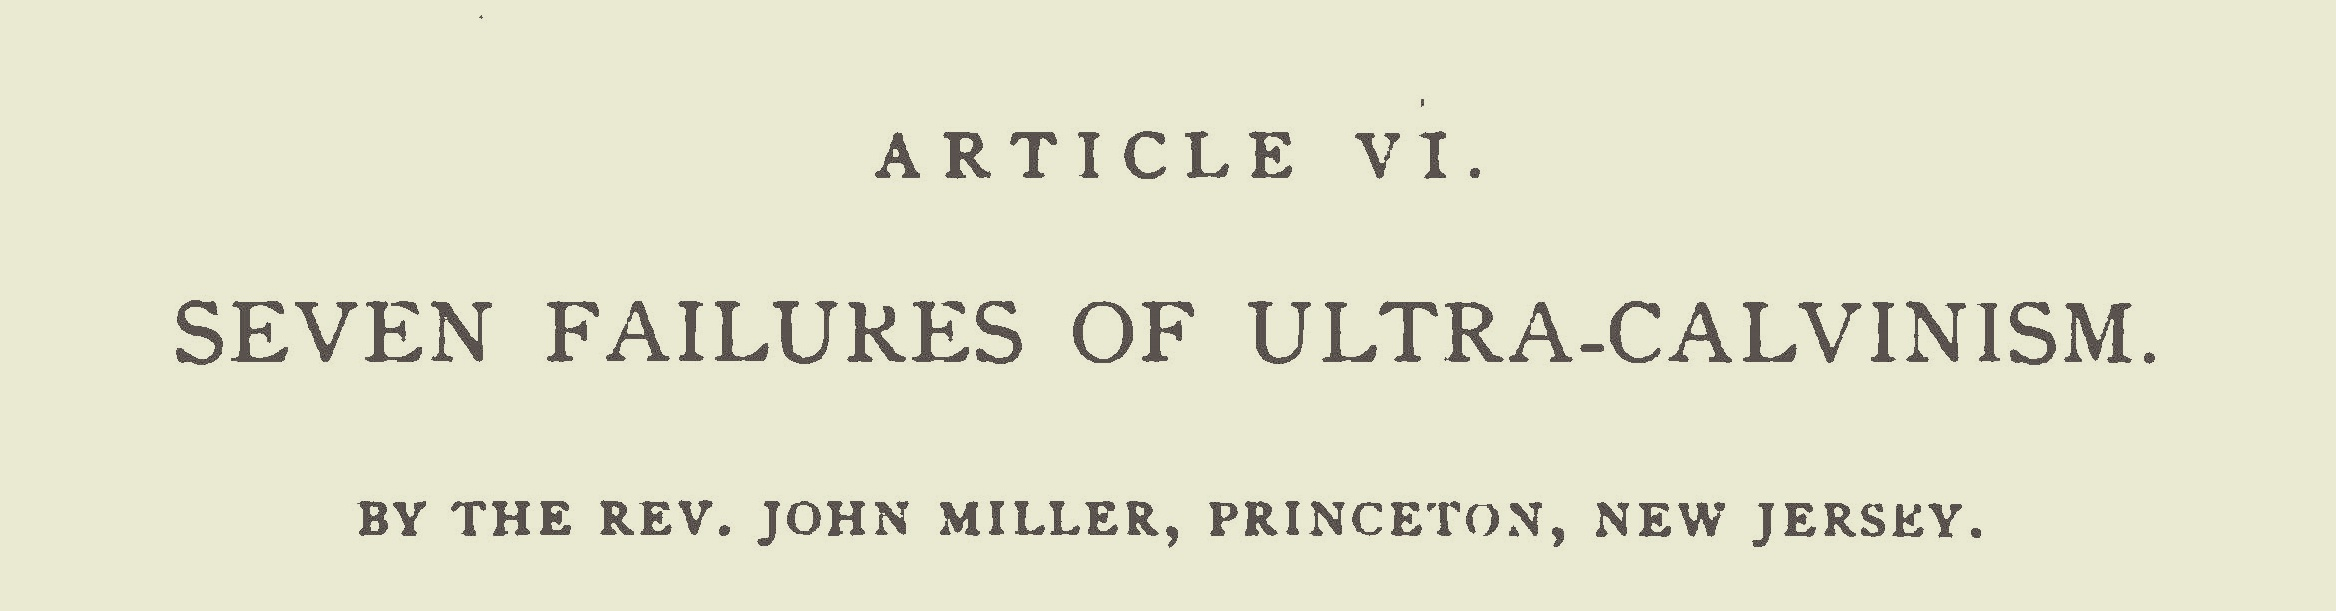 Miller, John, Seven Failures of Ultra-Calvinism Title Page.jpg